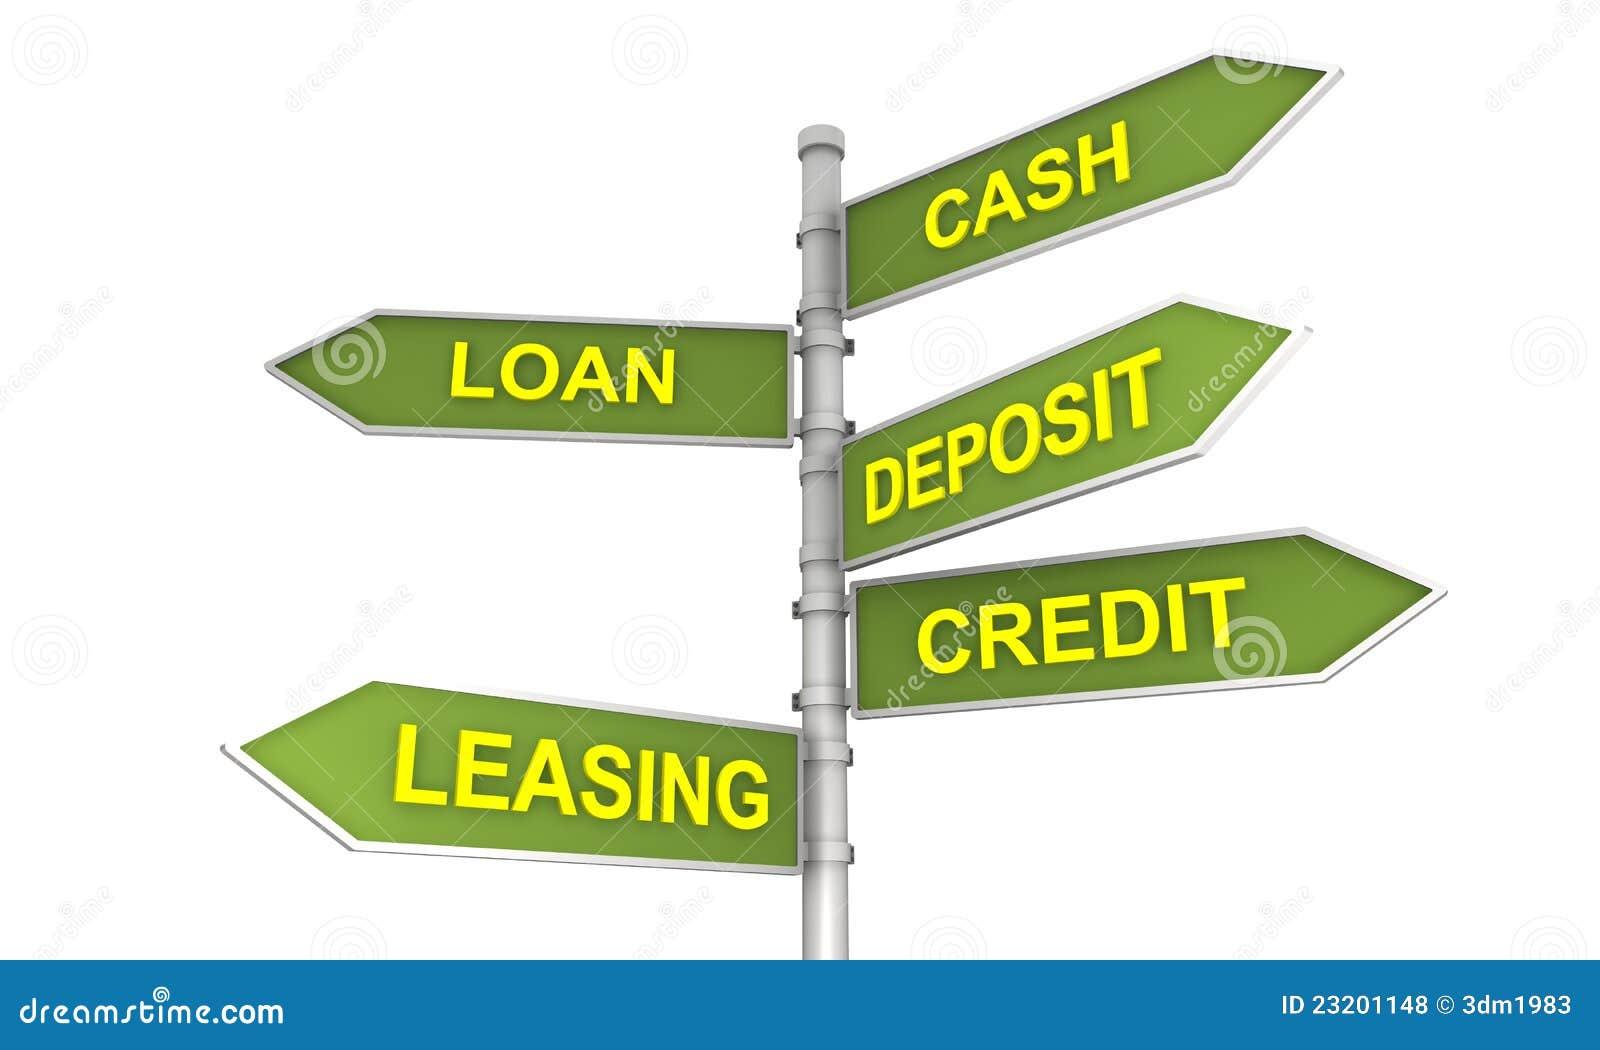 Options trading finance